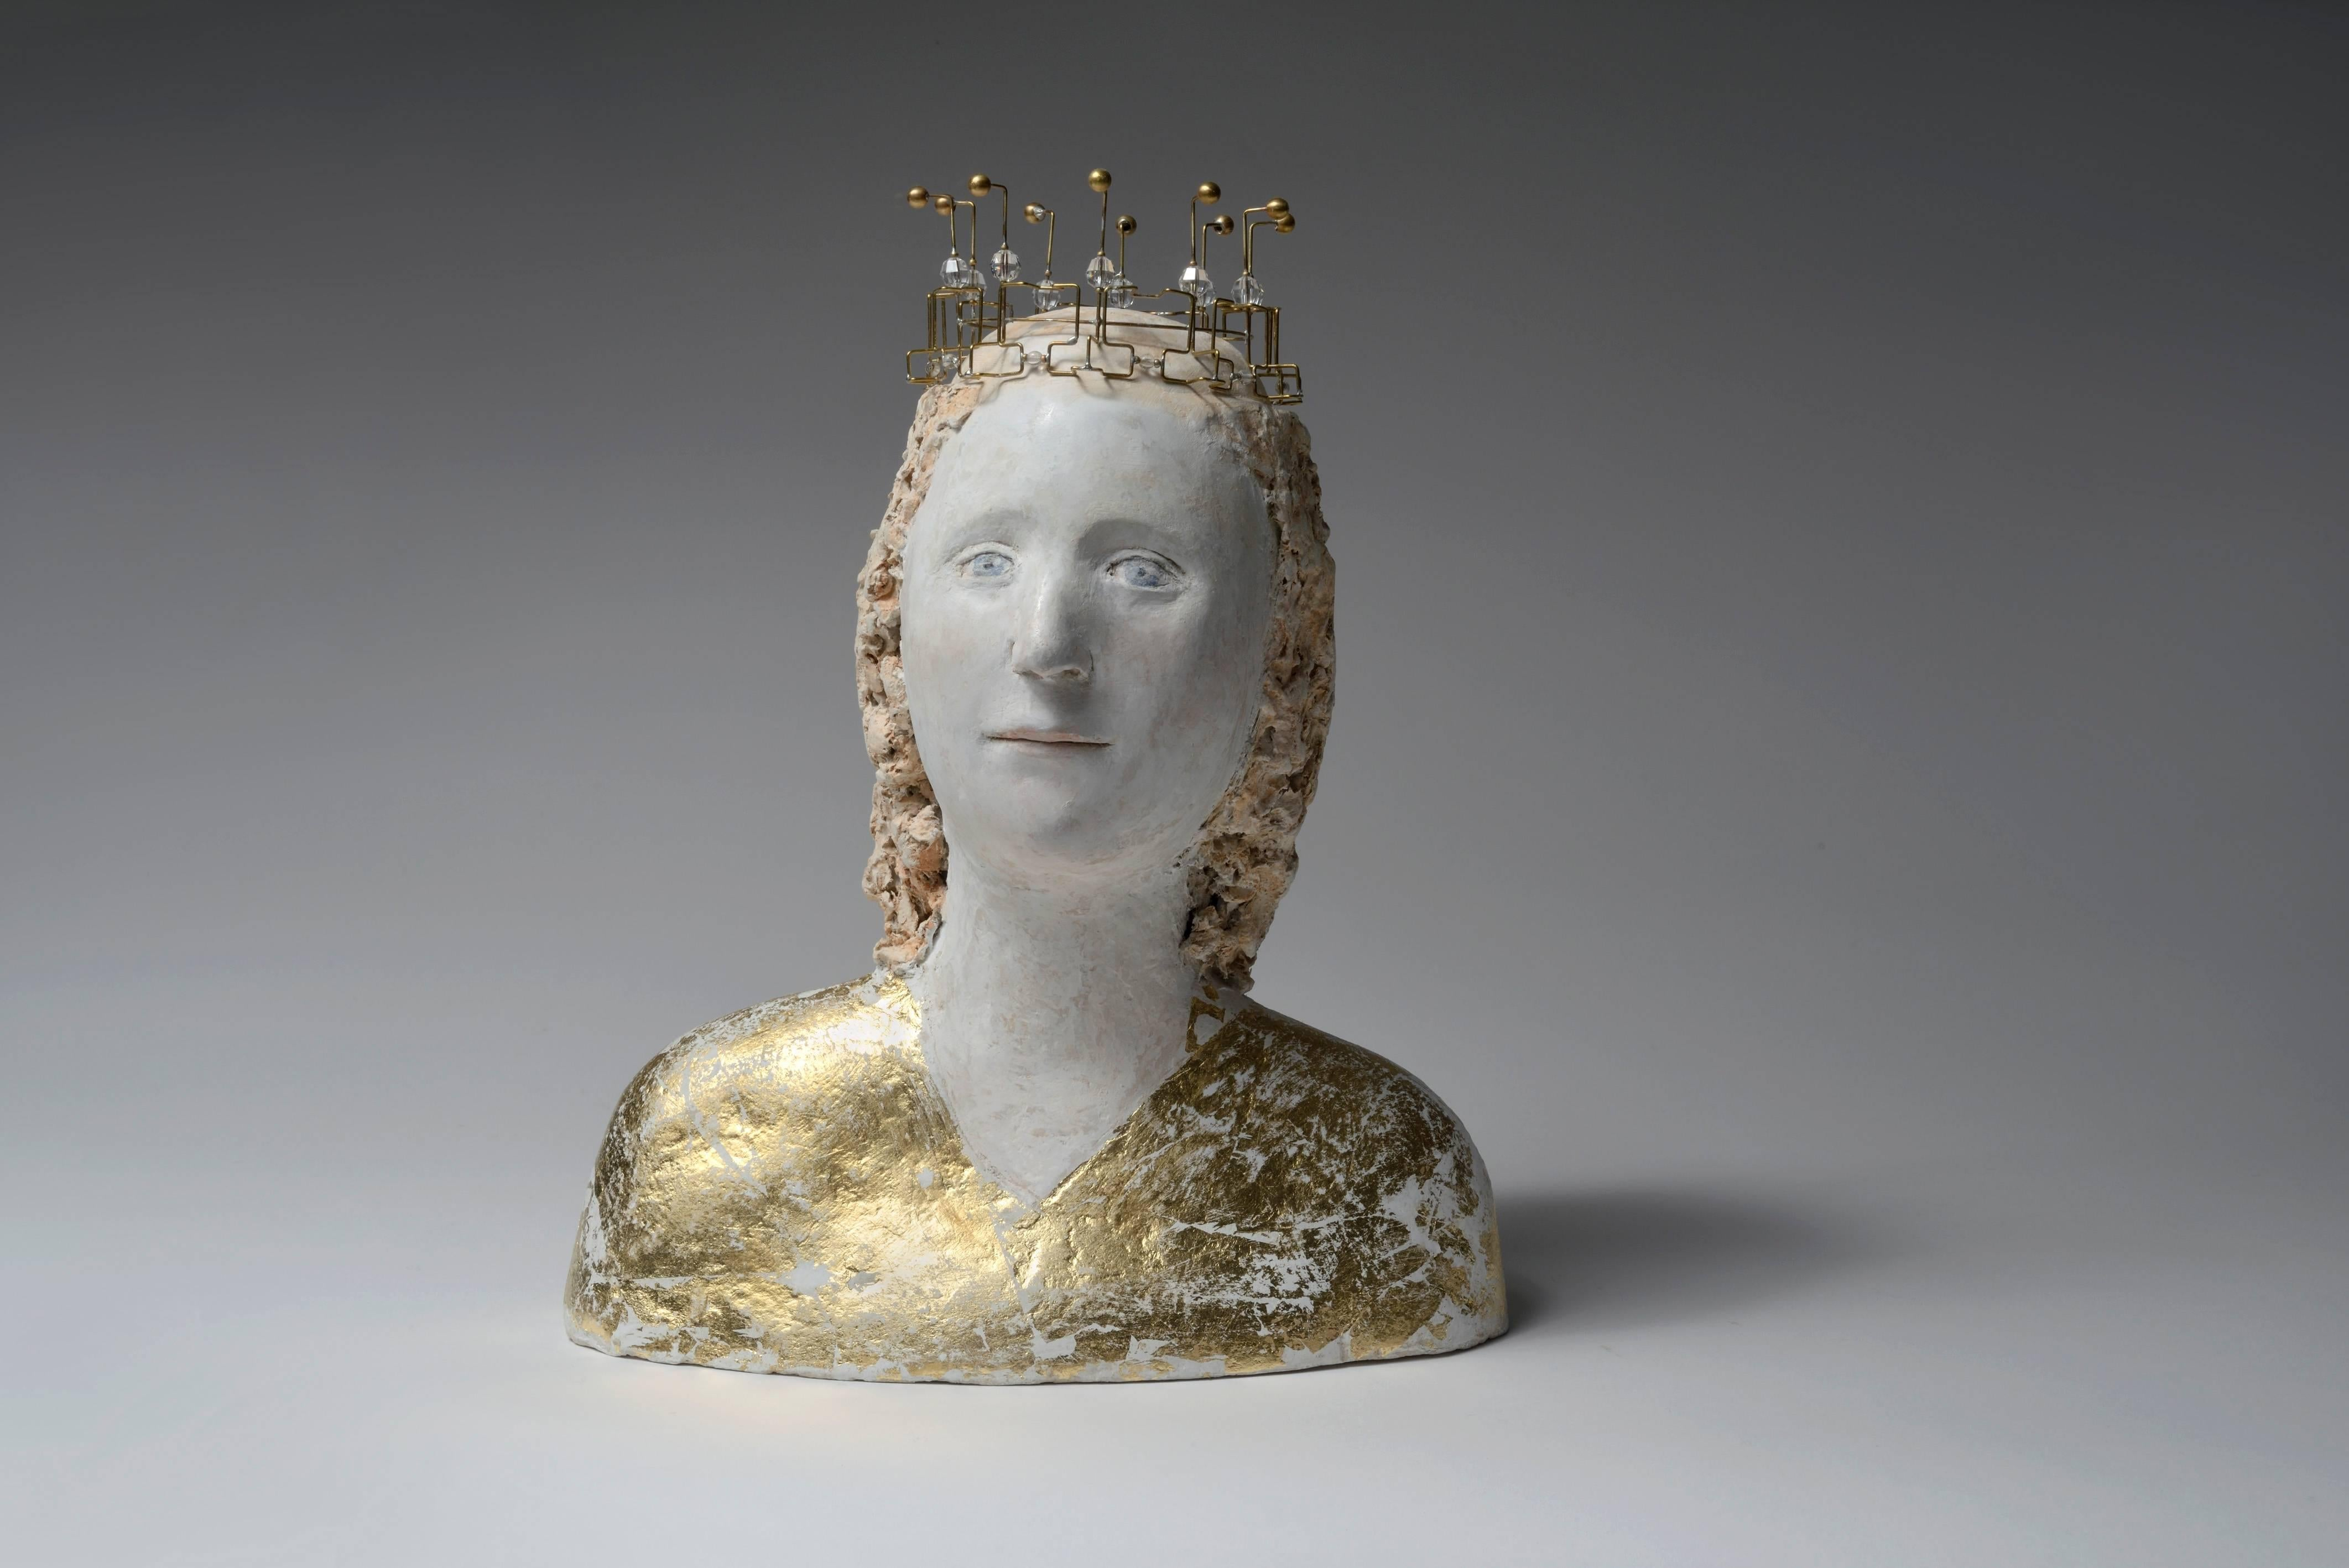 Petite reine ave couronne